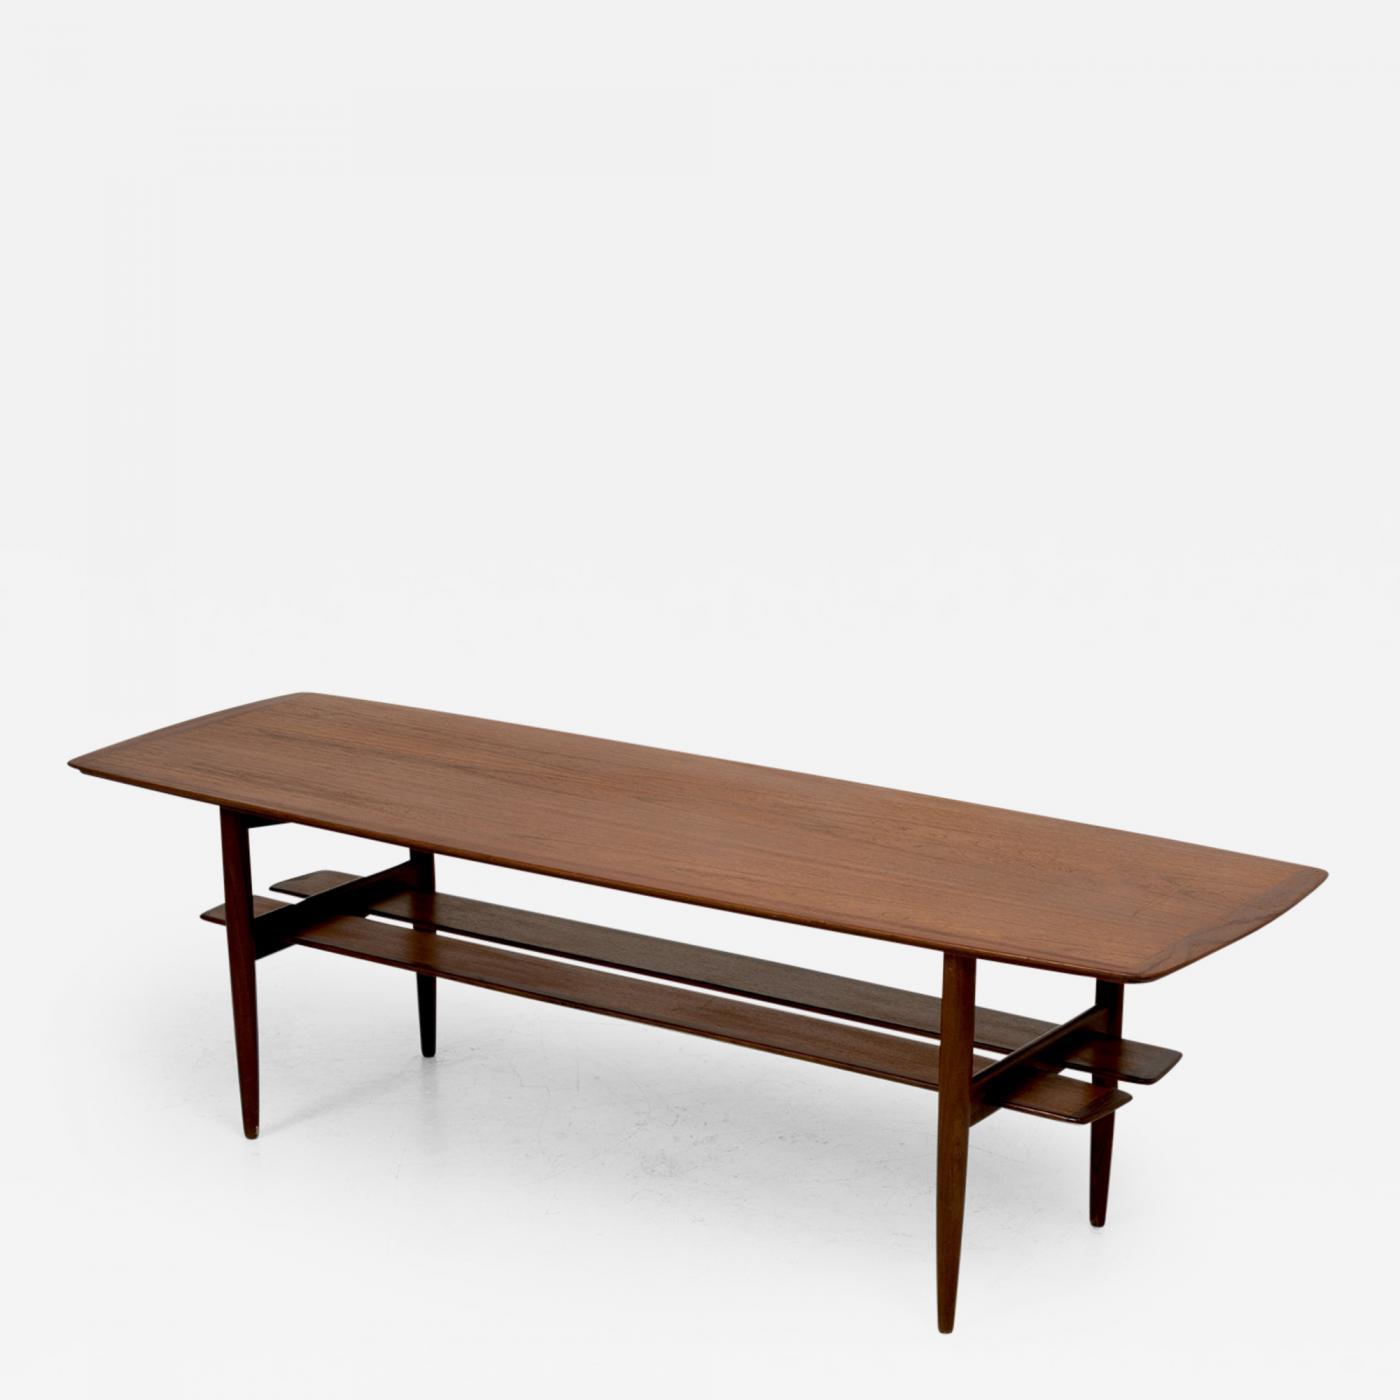 H W Klein Teak Coffee Table by H W Klein for Bramin Mobler